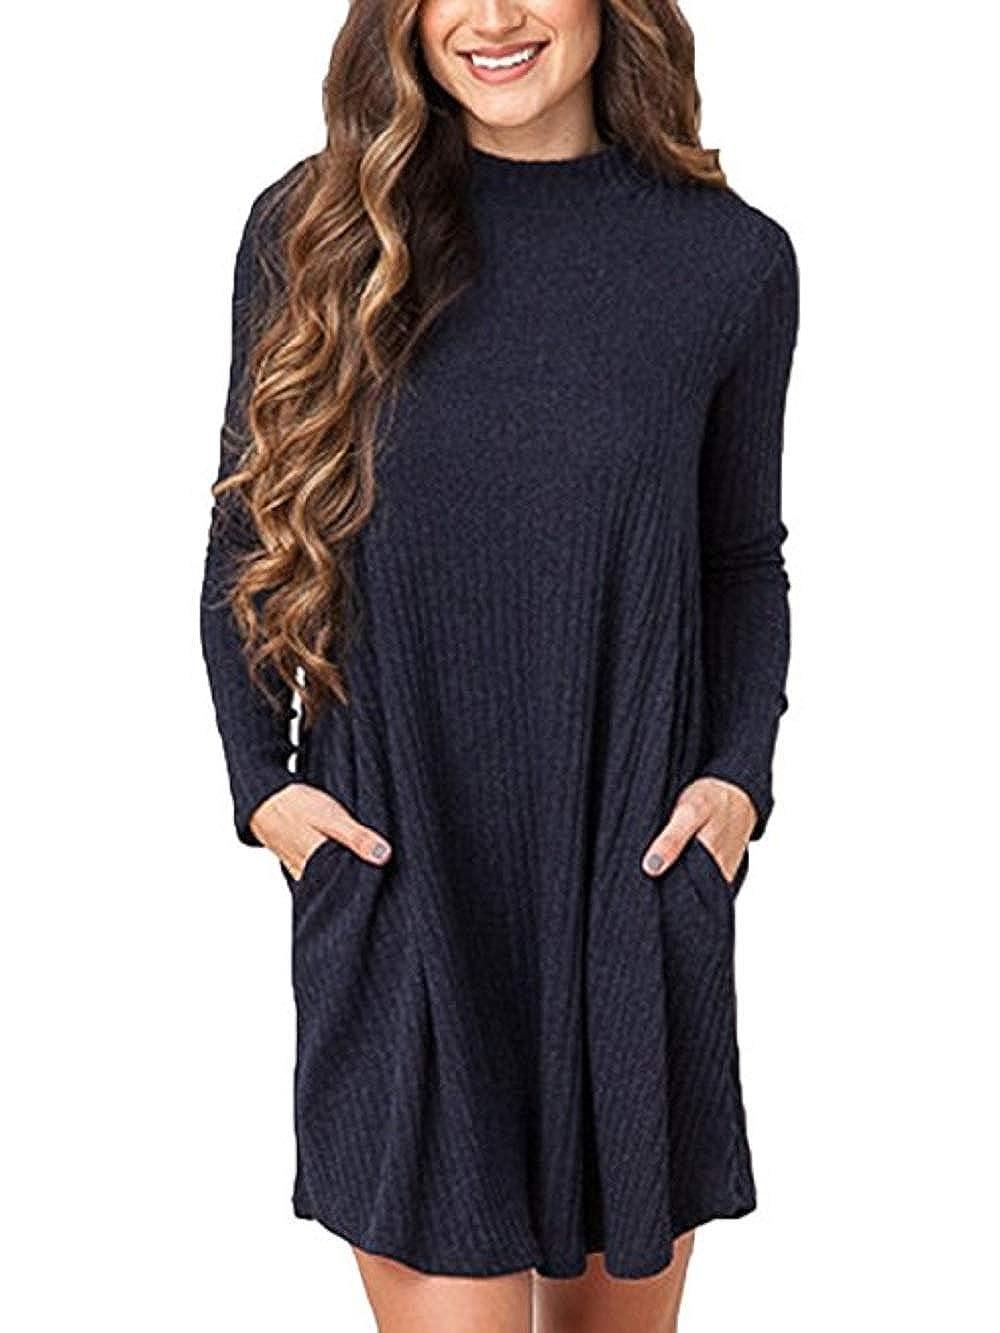 TALLA EU 38=Tag Size L. Summer Mae Mujer Jersey Invierno Suéter Largo Mangas Largas Vestido Corto Elegante Gris Oscuro EU 38=Tag Size L